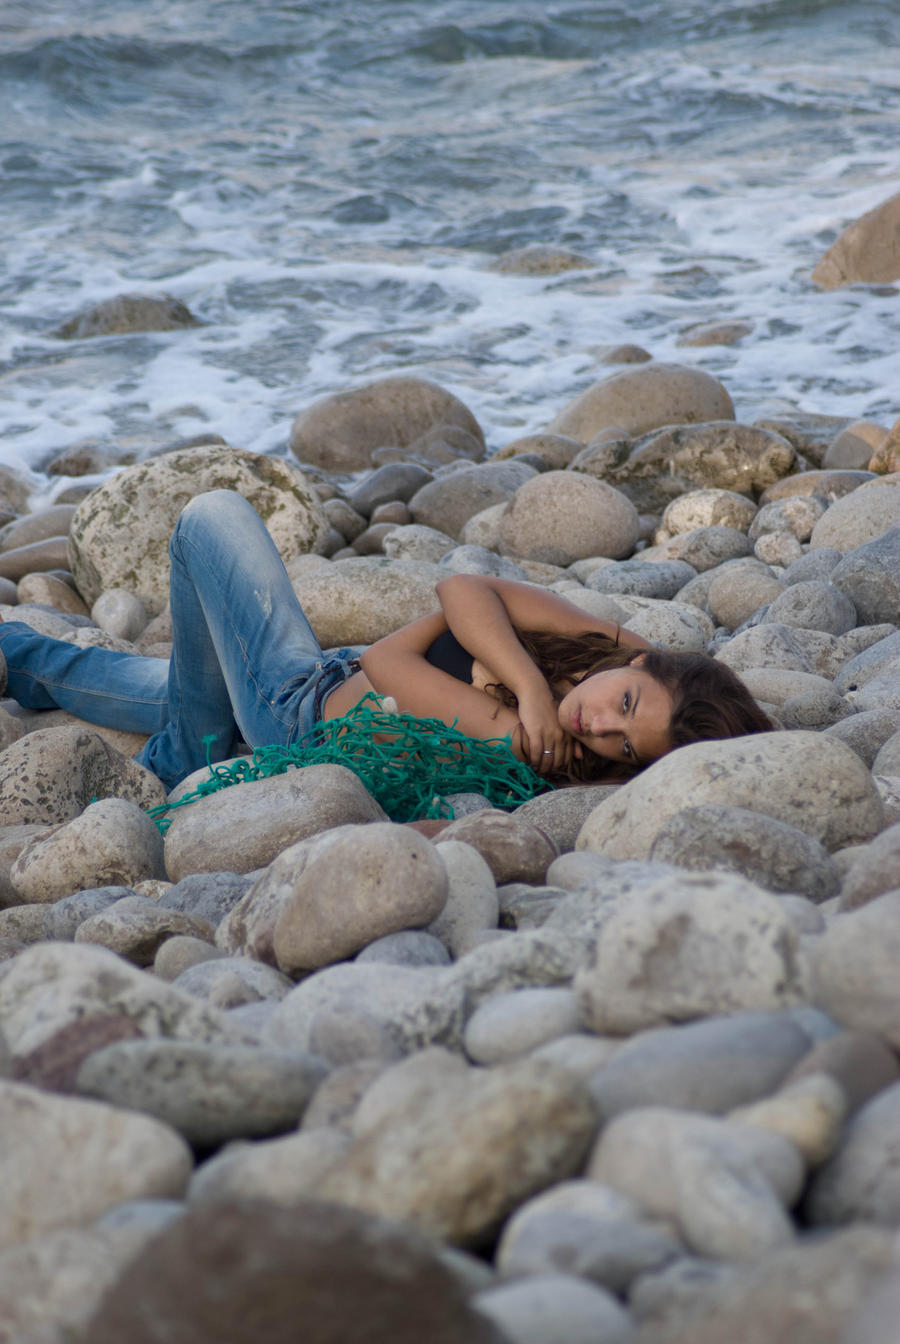 Stock at Beach 7 by catarinamzfernandes